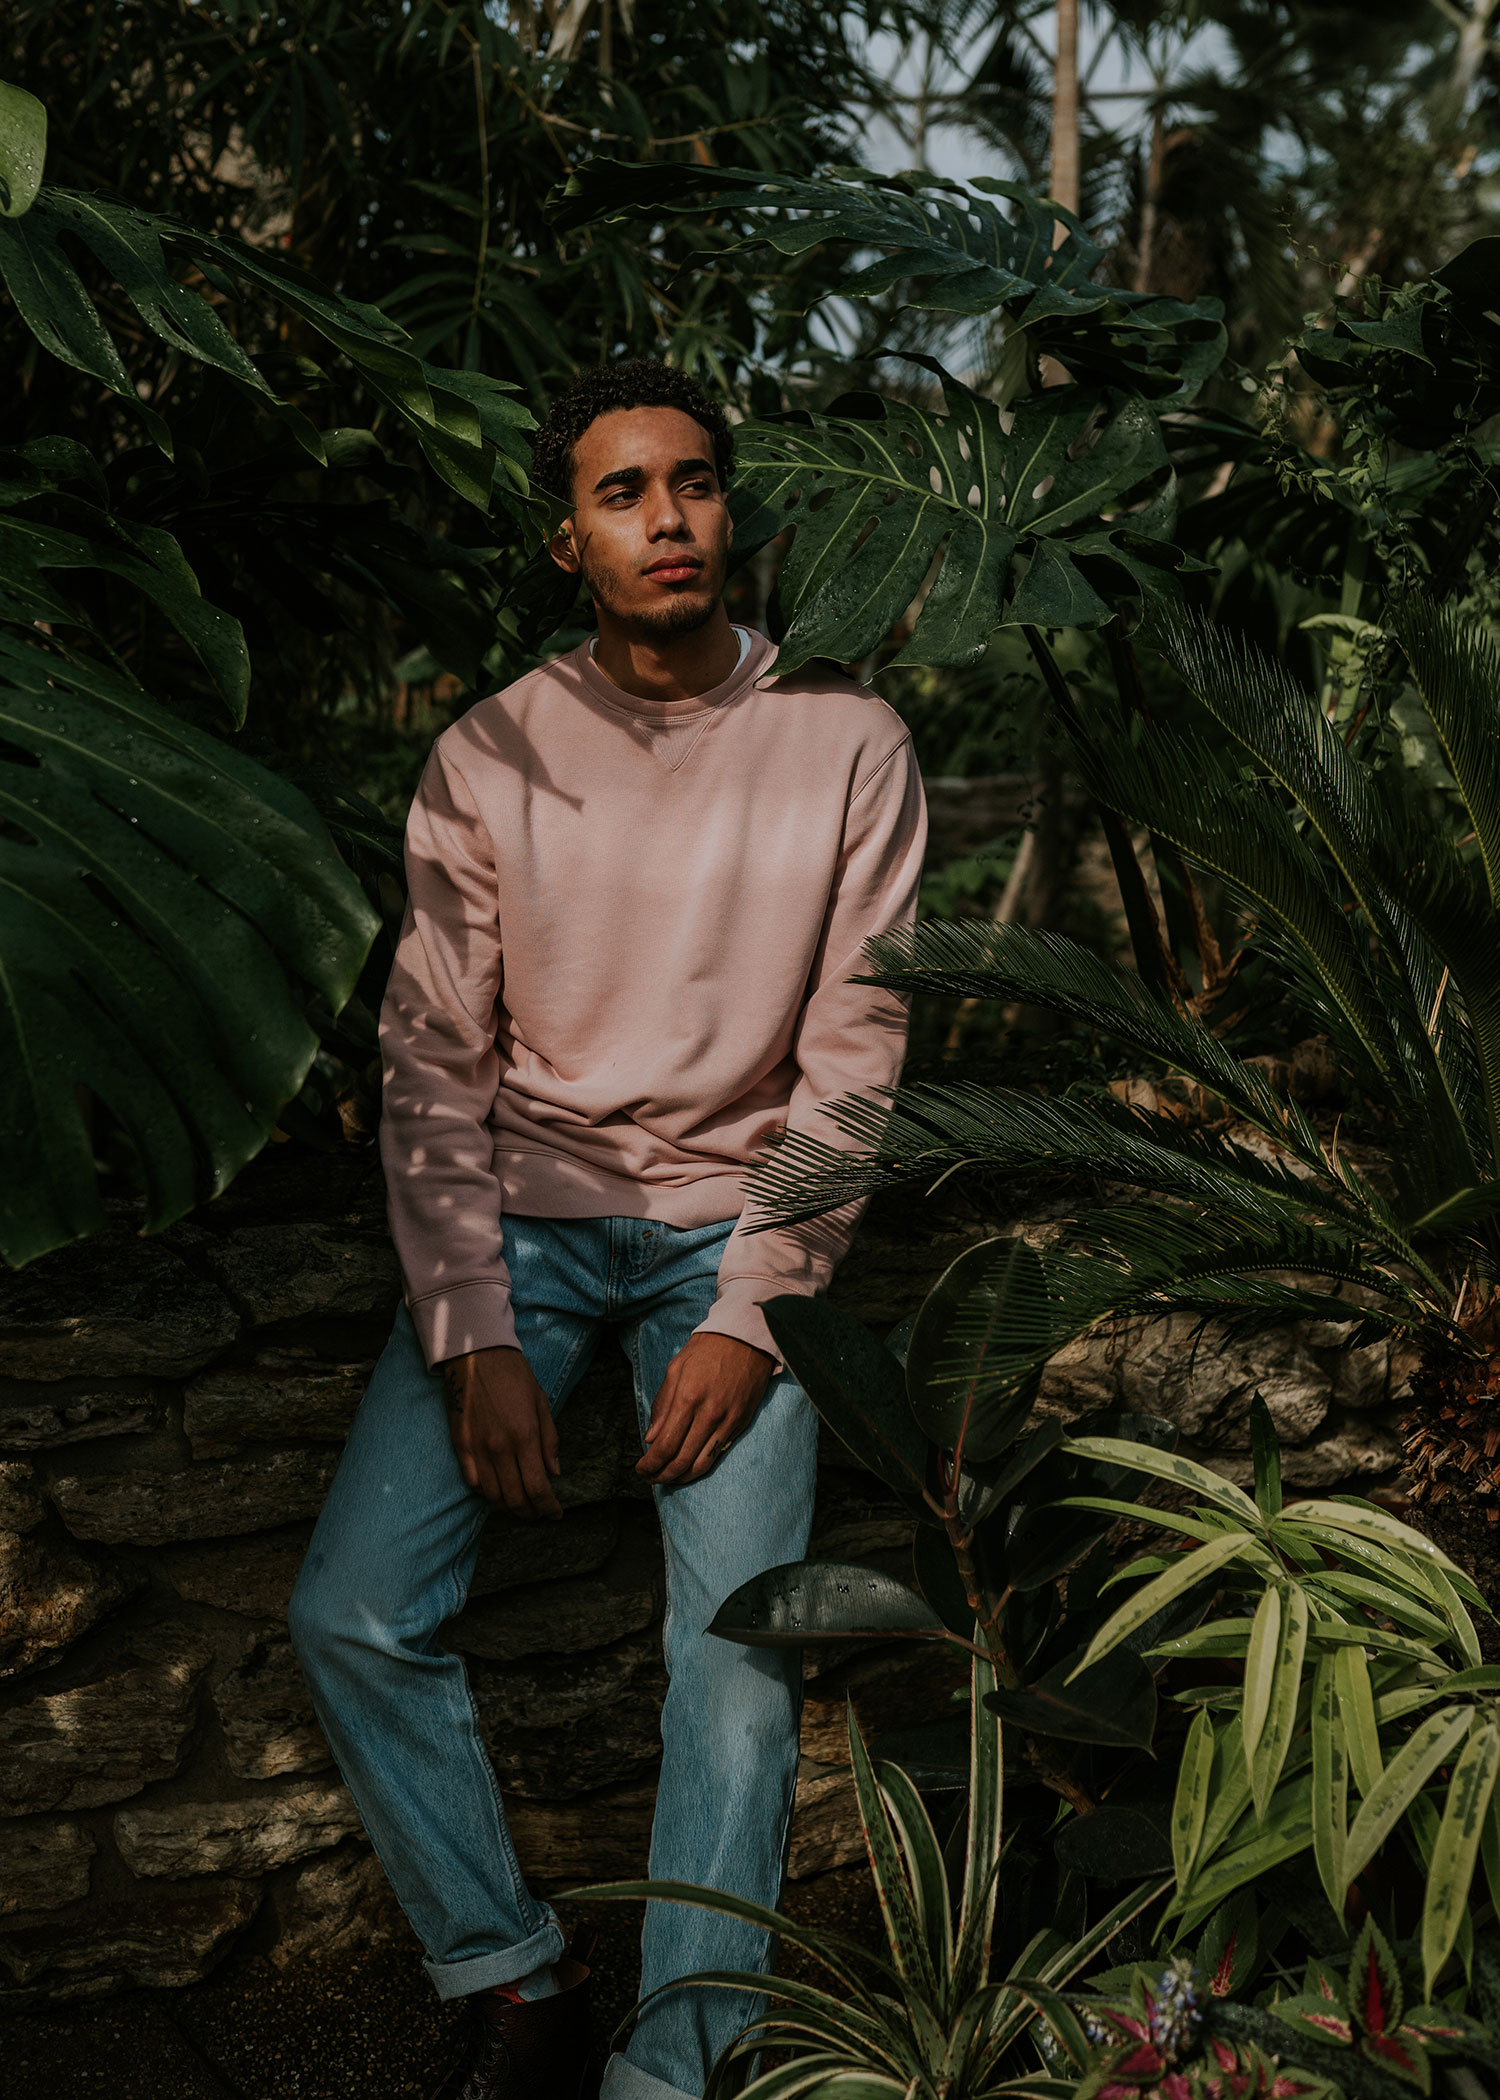 man-sitting-amongst-plants-botanical-gardens-engagement-desmoines-iowa-raelyn-ramey-photography.jpg